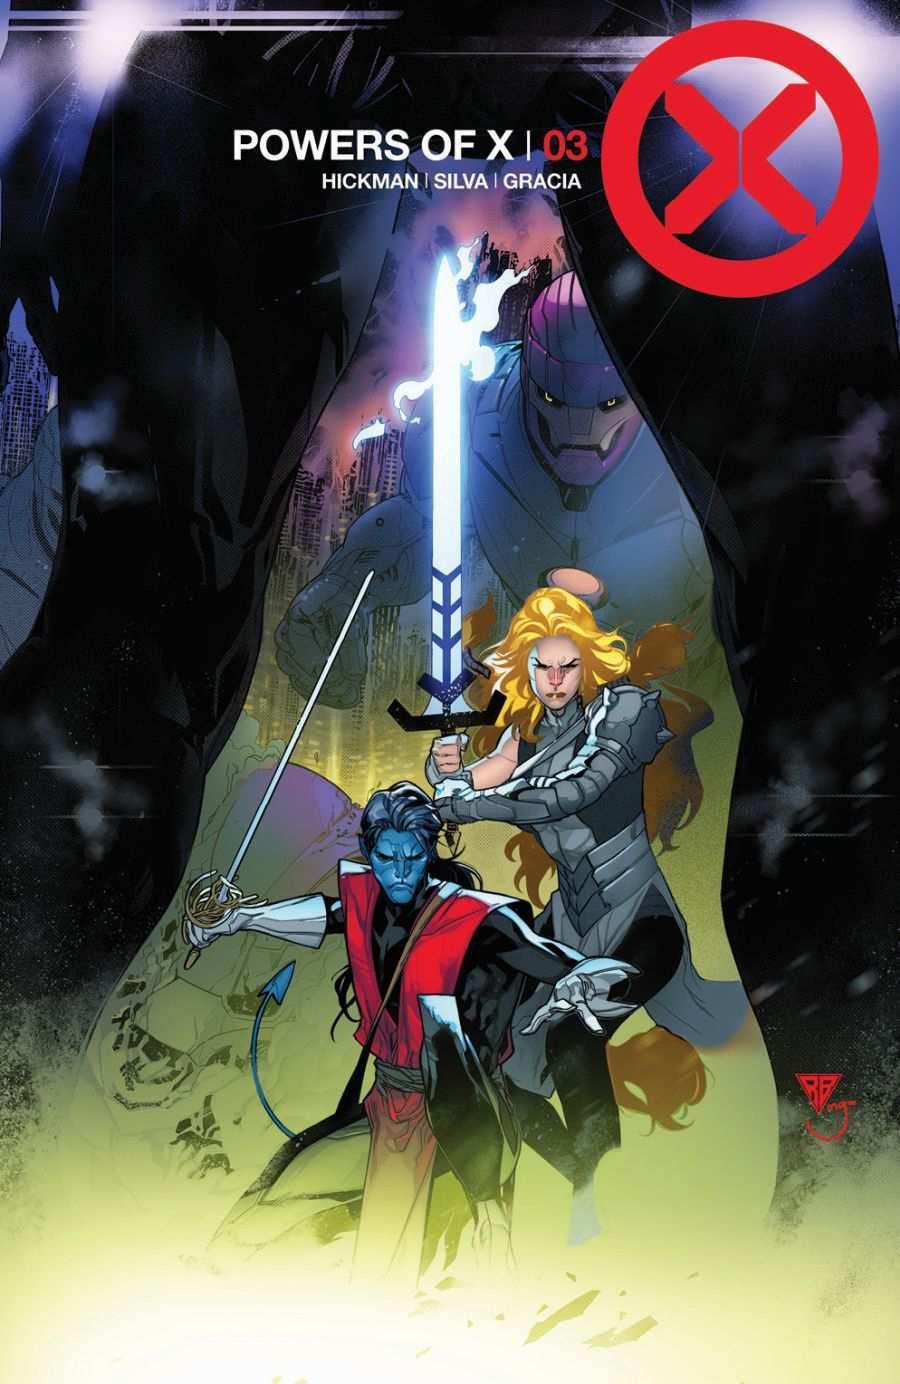 comics x-men powers of x